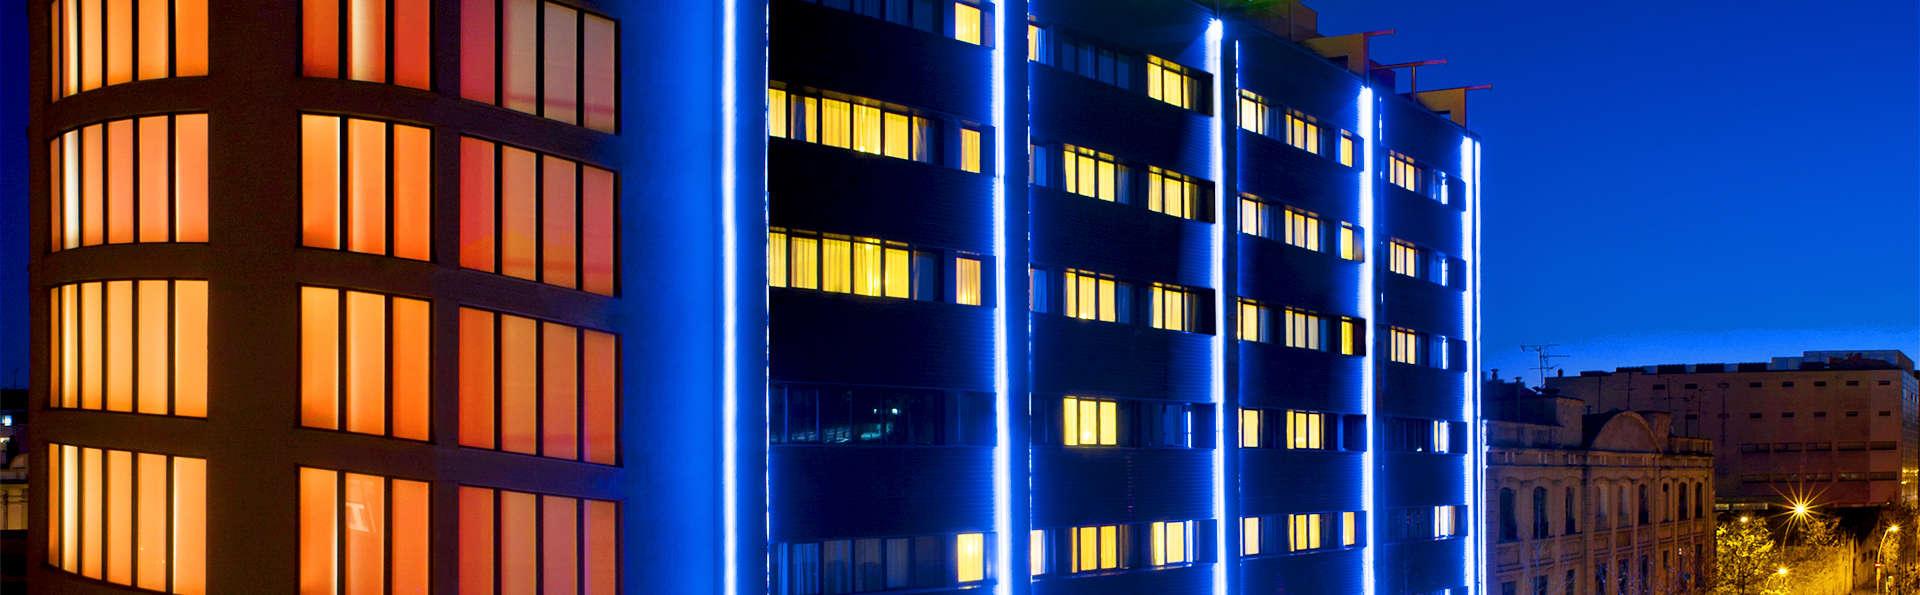 Sallés Hotel Pere IV - EDIT_1_FACHADA.jpg